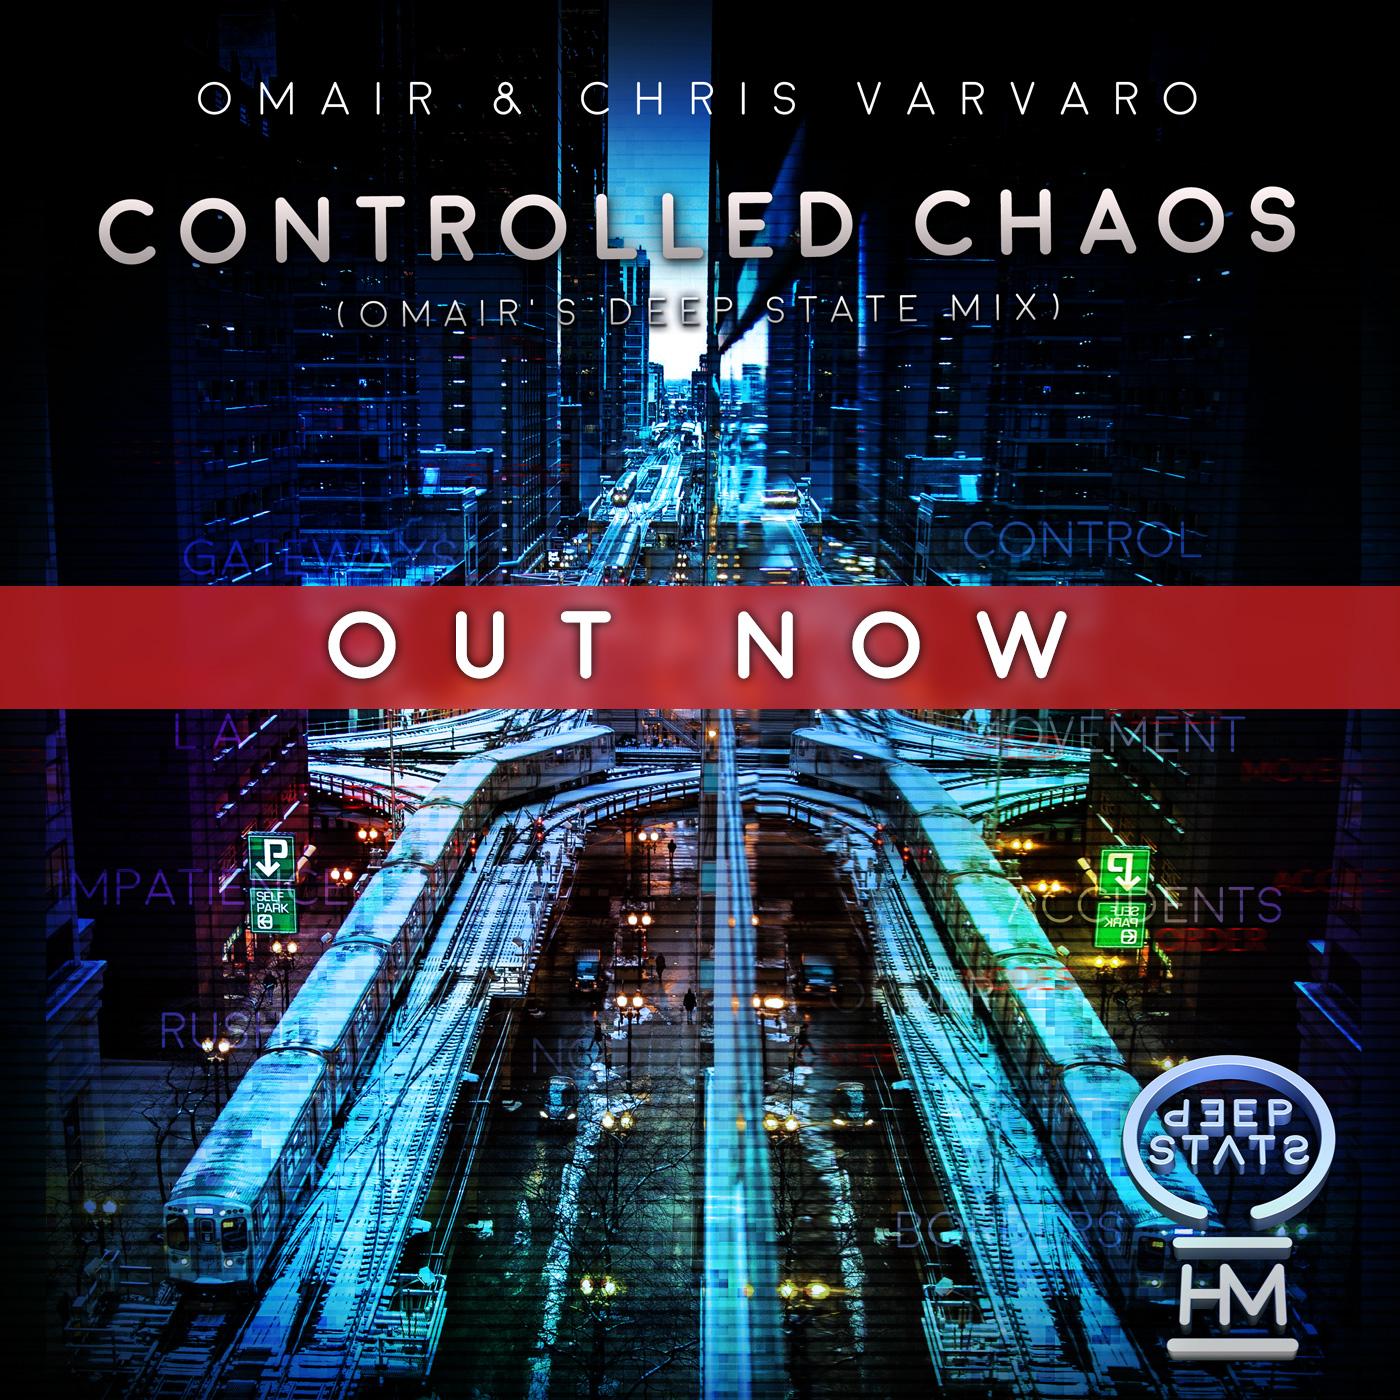 OHMMDS-OMAIR-ControlledChaos_OUTNOW.jpg